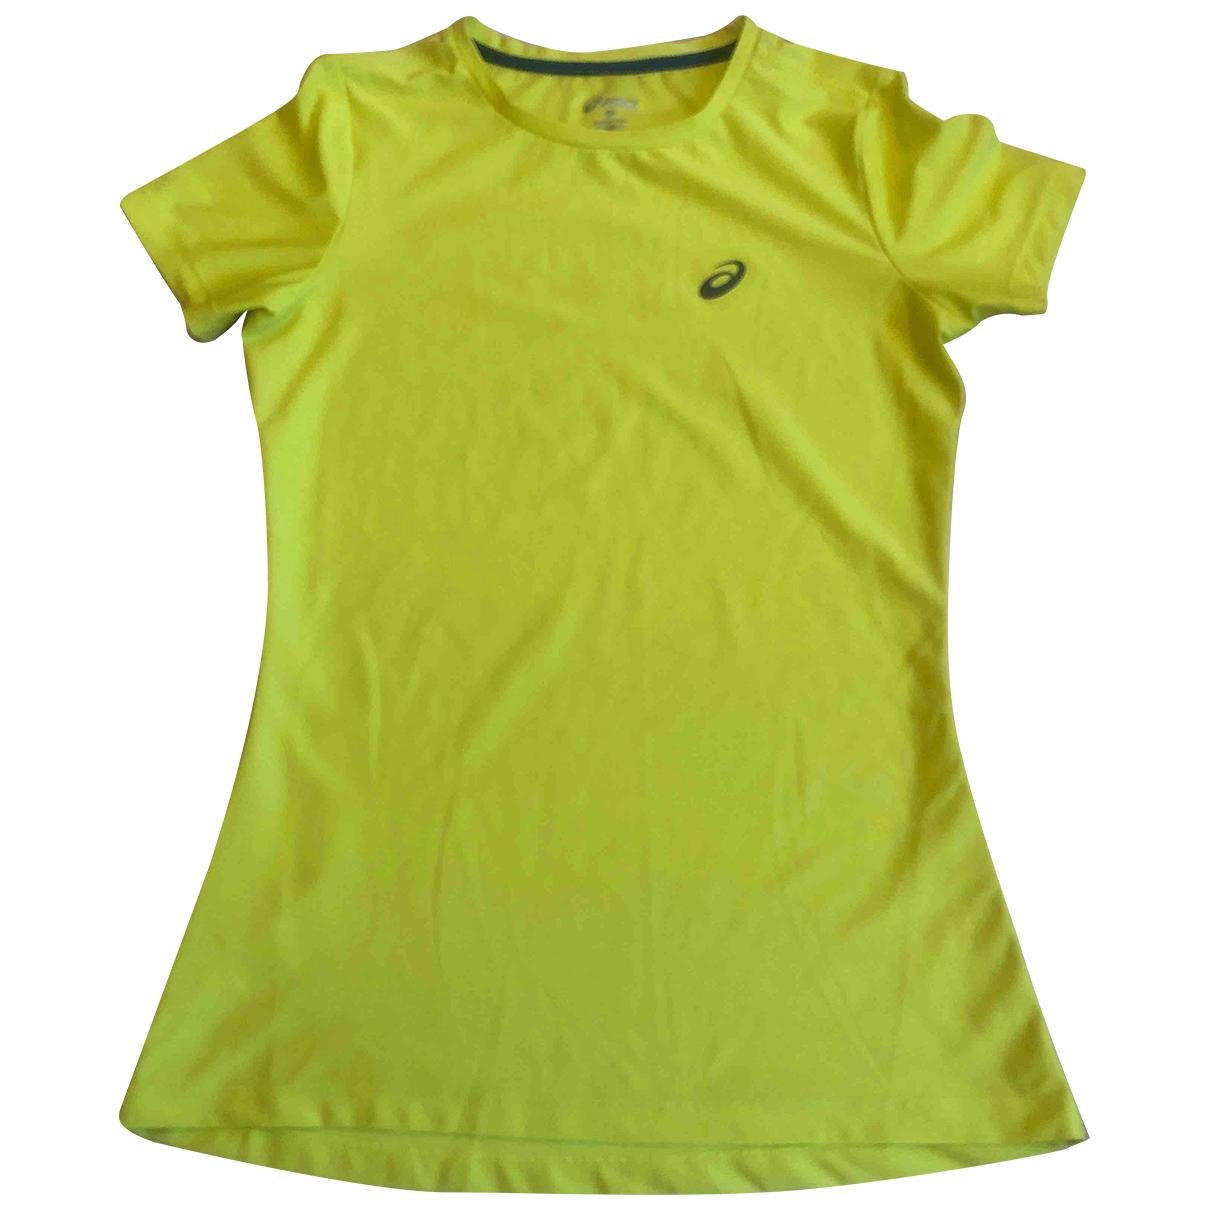 Asics \N Yellow  top for Women XS International